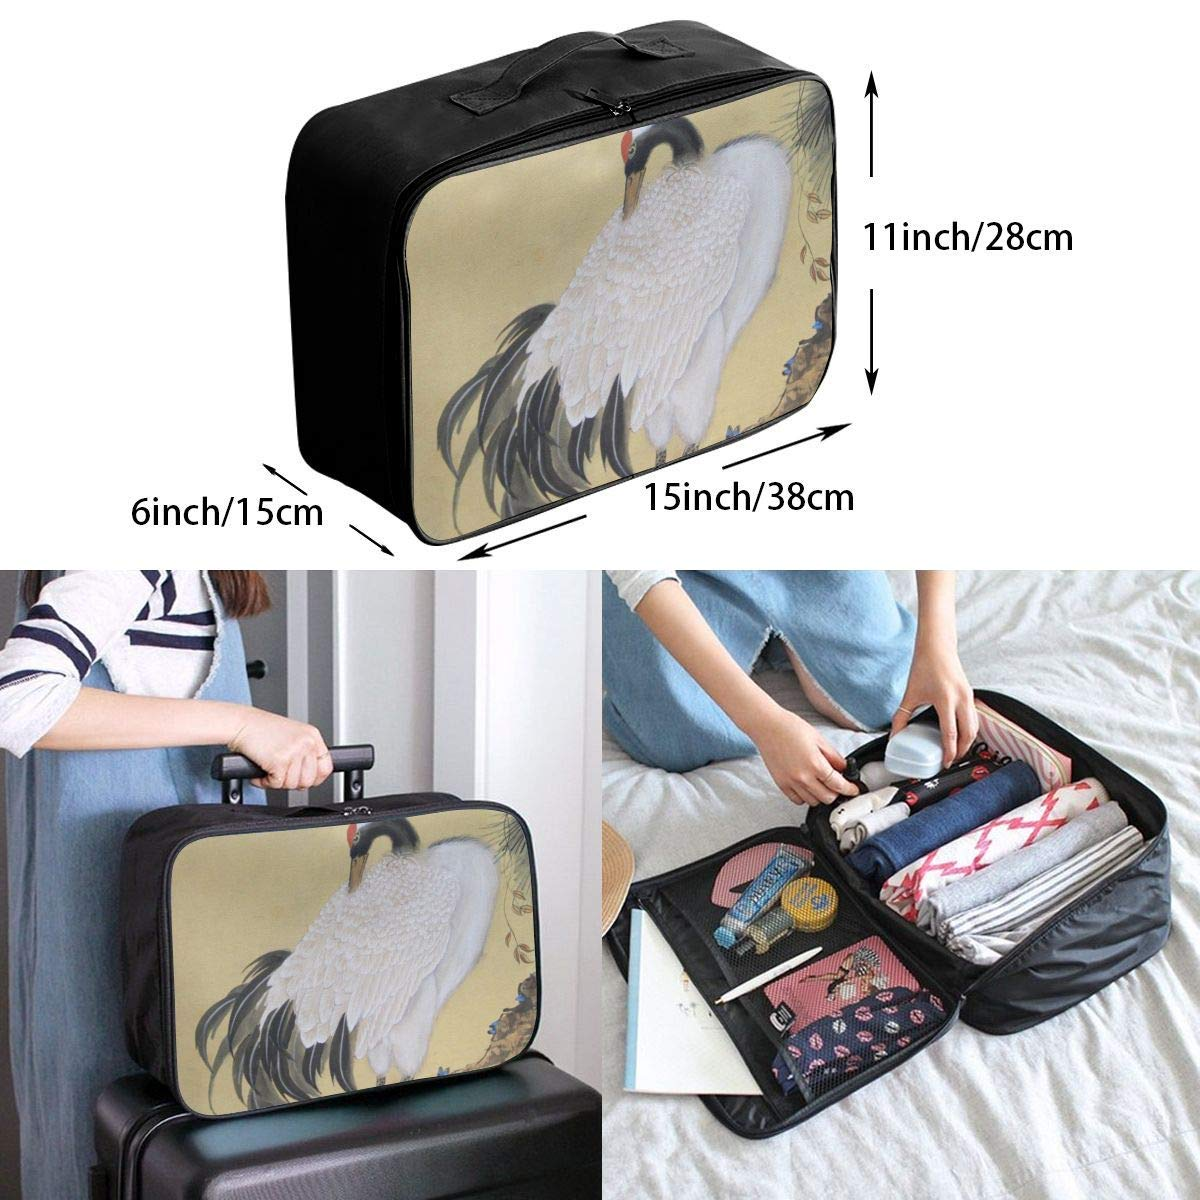 JTRVW Luggage Bags for Travel Lightweight Large Capacity Portable Duffel Bag for Men /& Women Tree White Crane Travel Duffel Bag Backpack